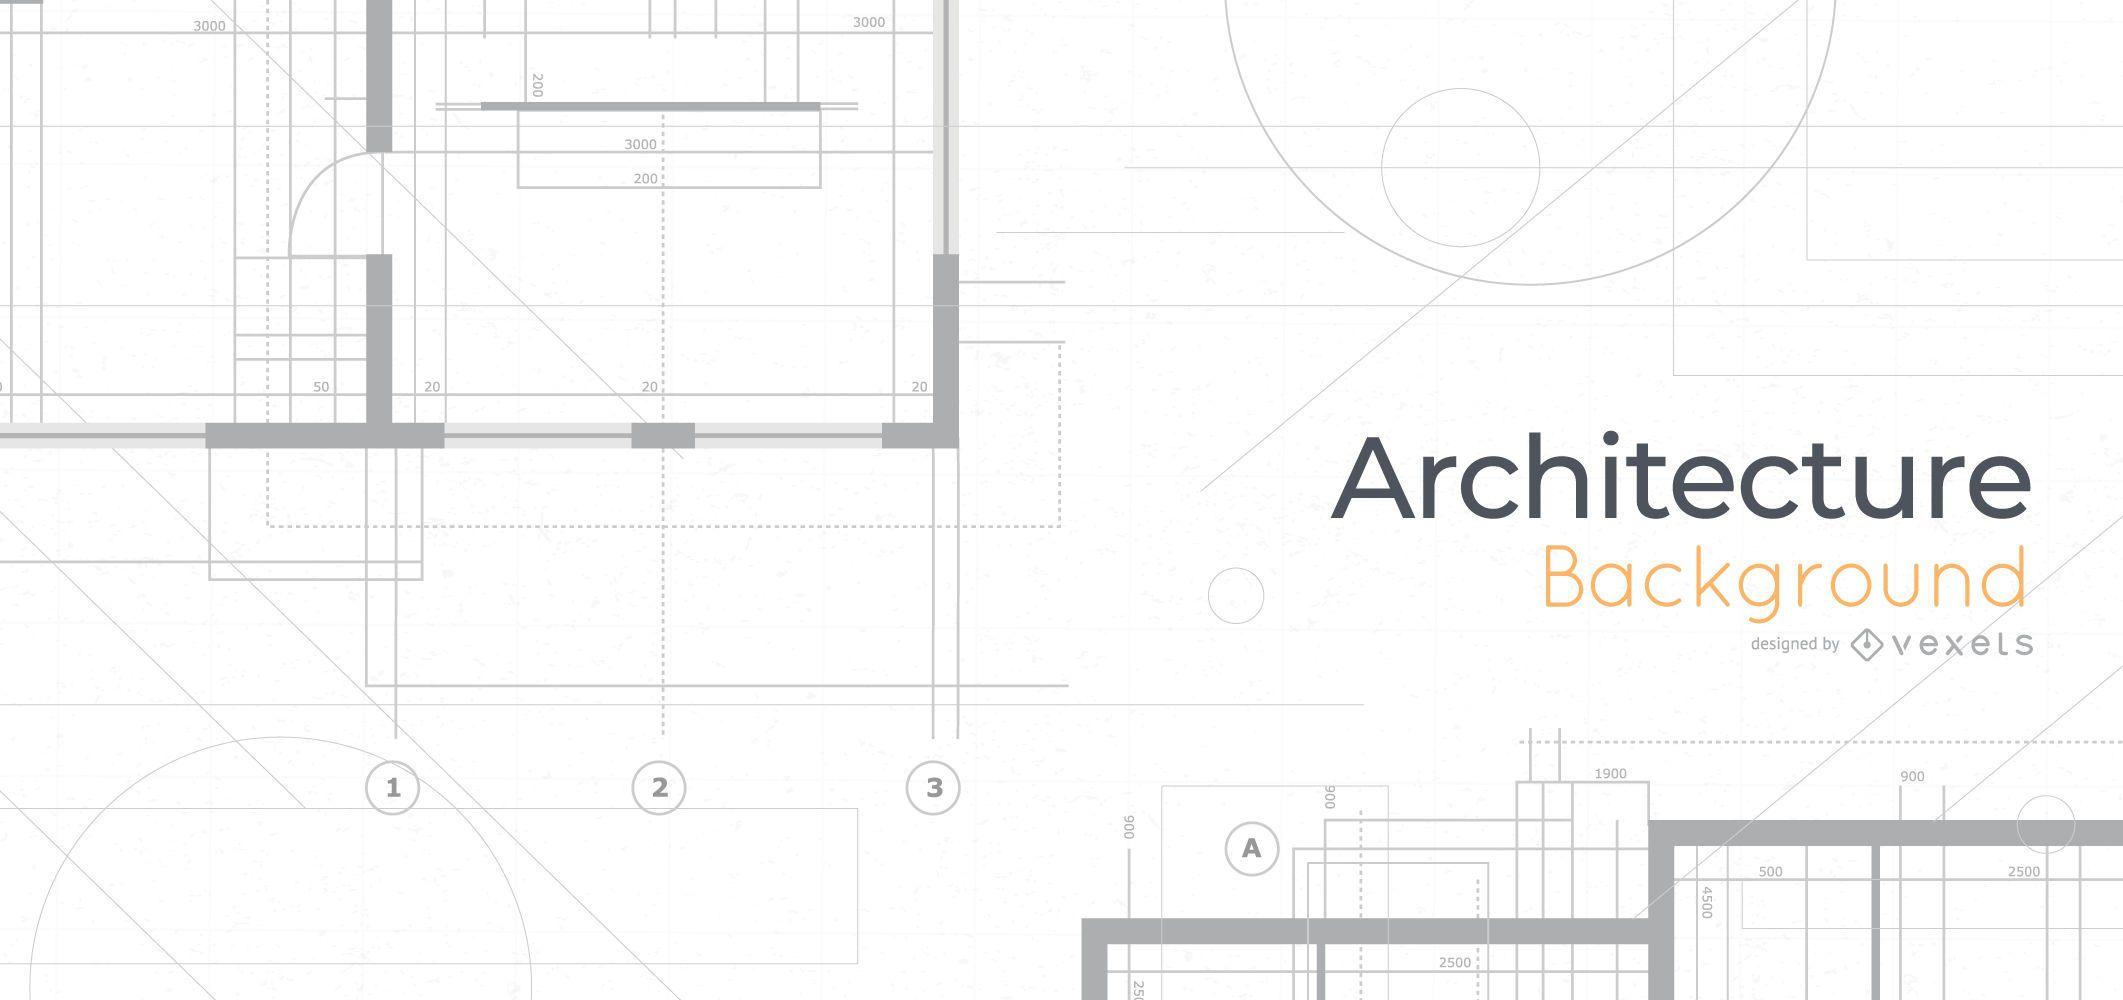 Architecture Blueprints Background Design